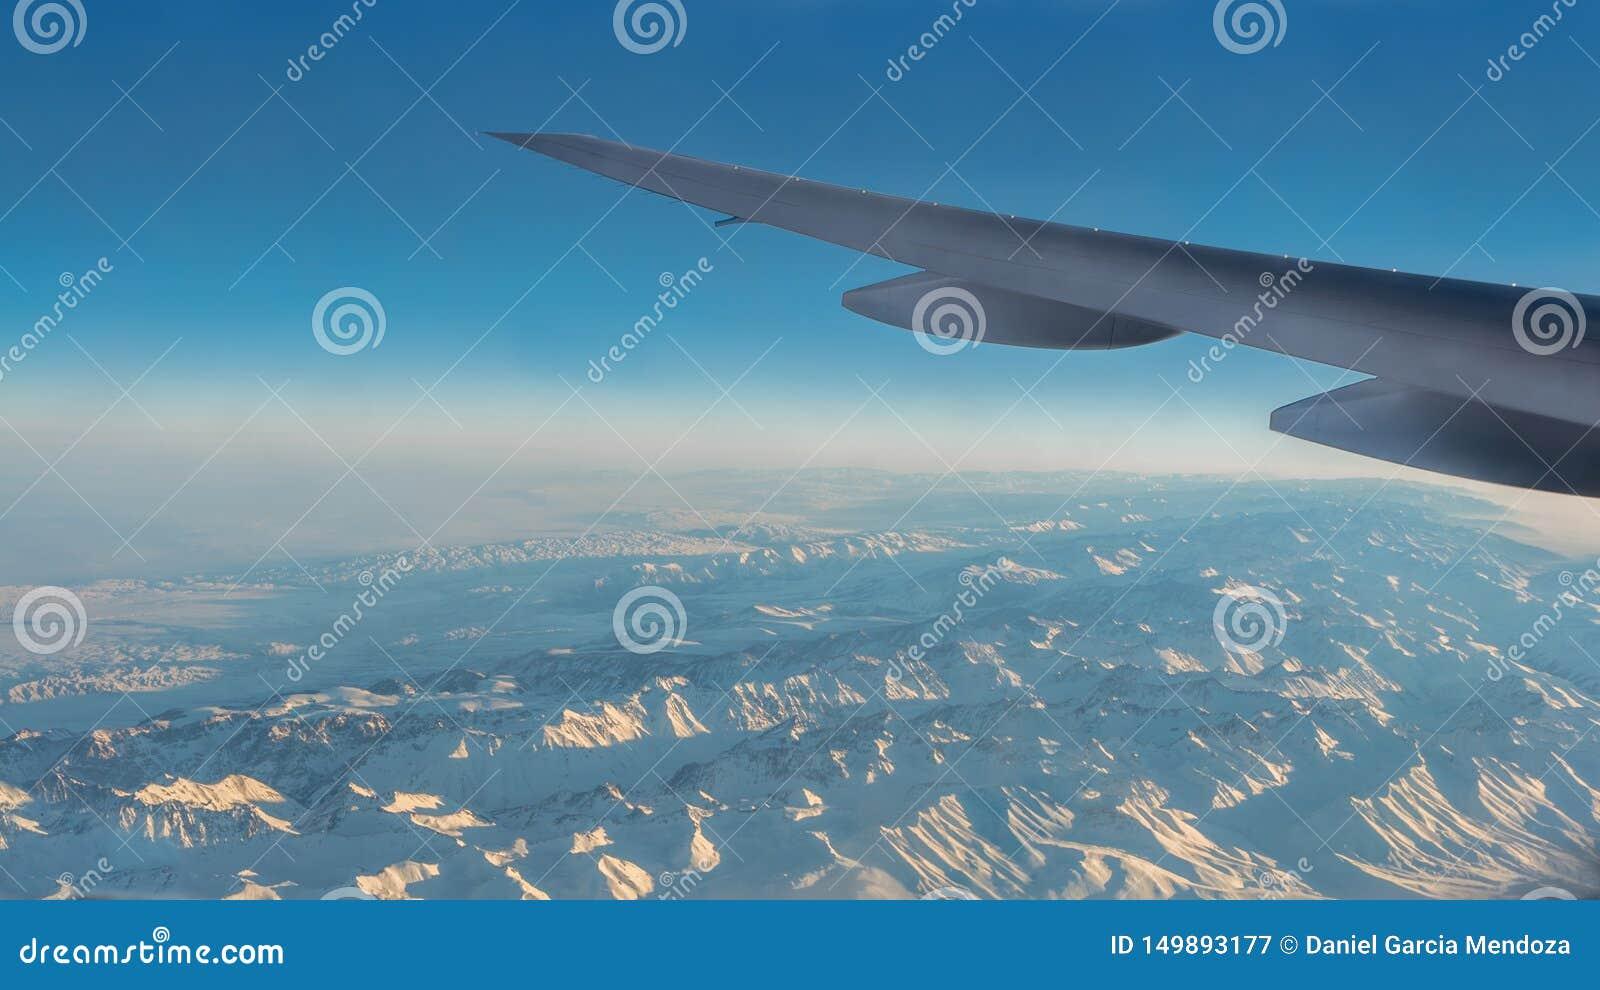 Wonderful View Of Tian Shan Snow Mountains Through Window An Airplane